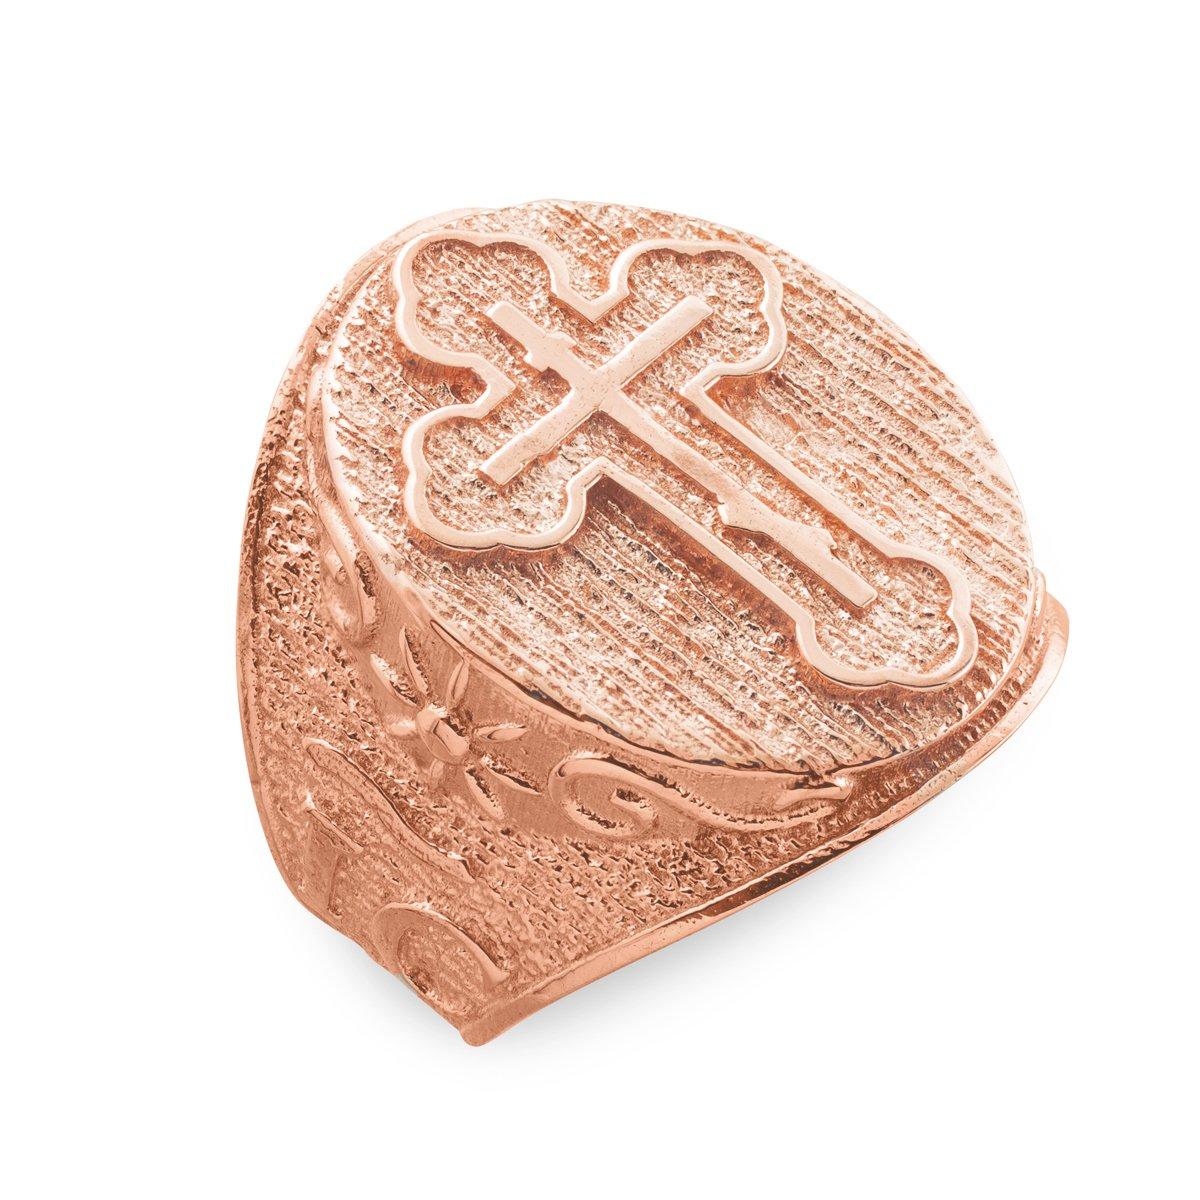 Fine 14k Rose Gold Celtic Cross Trinity Knot Ring (Size 9.75)